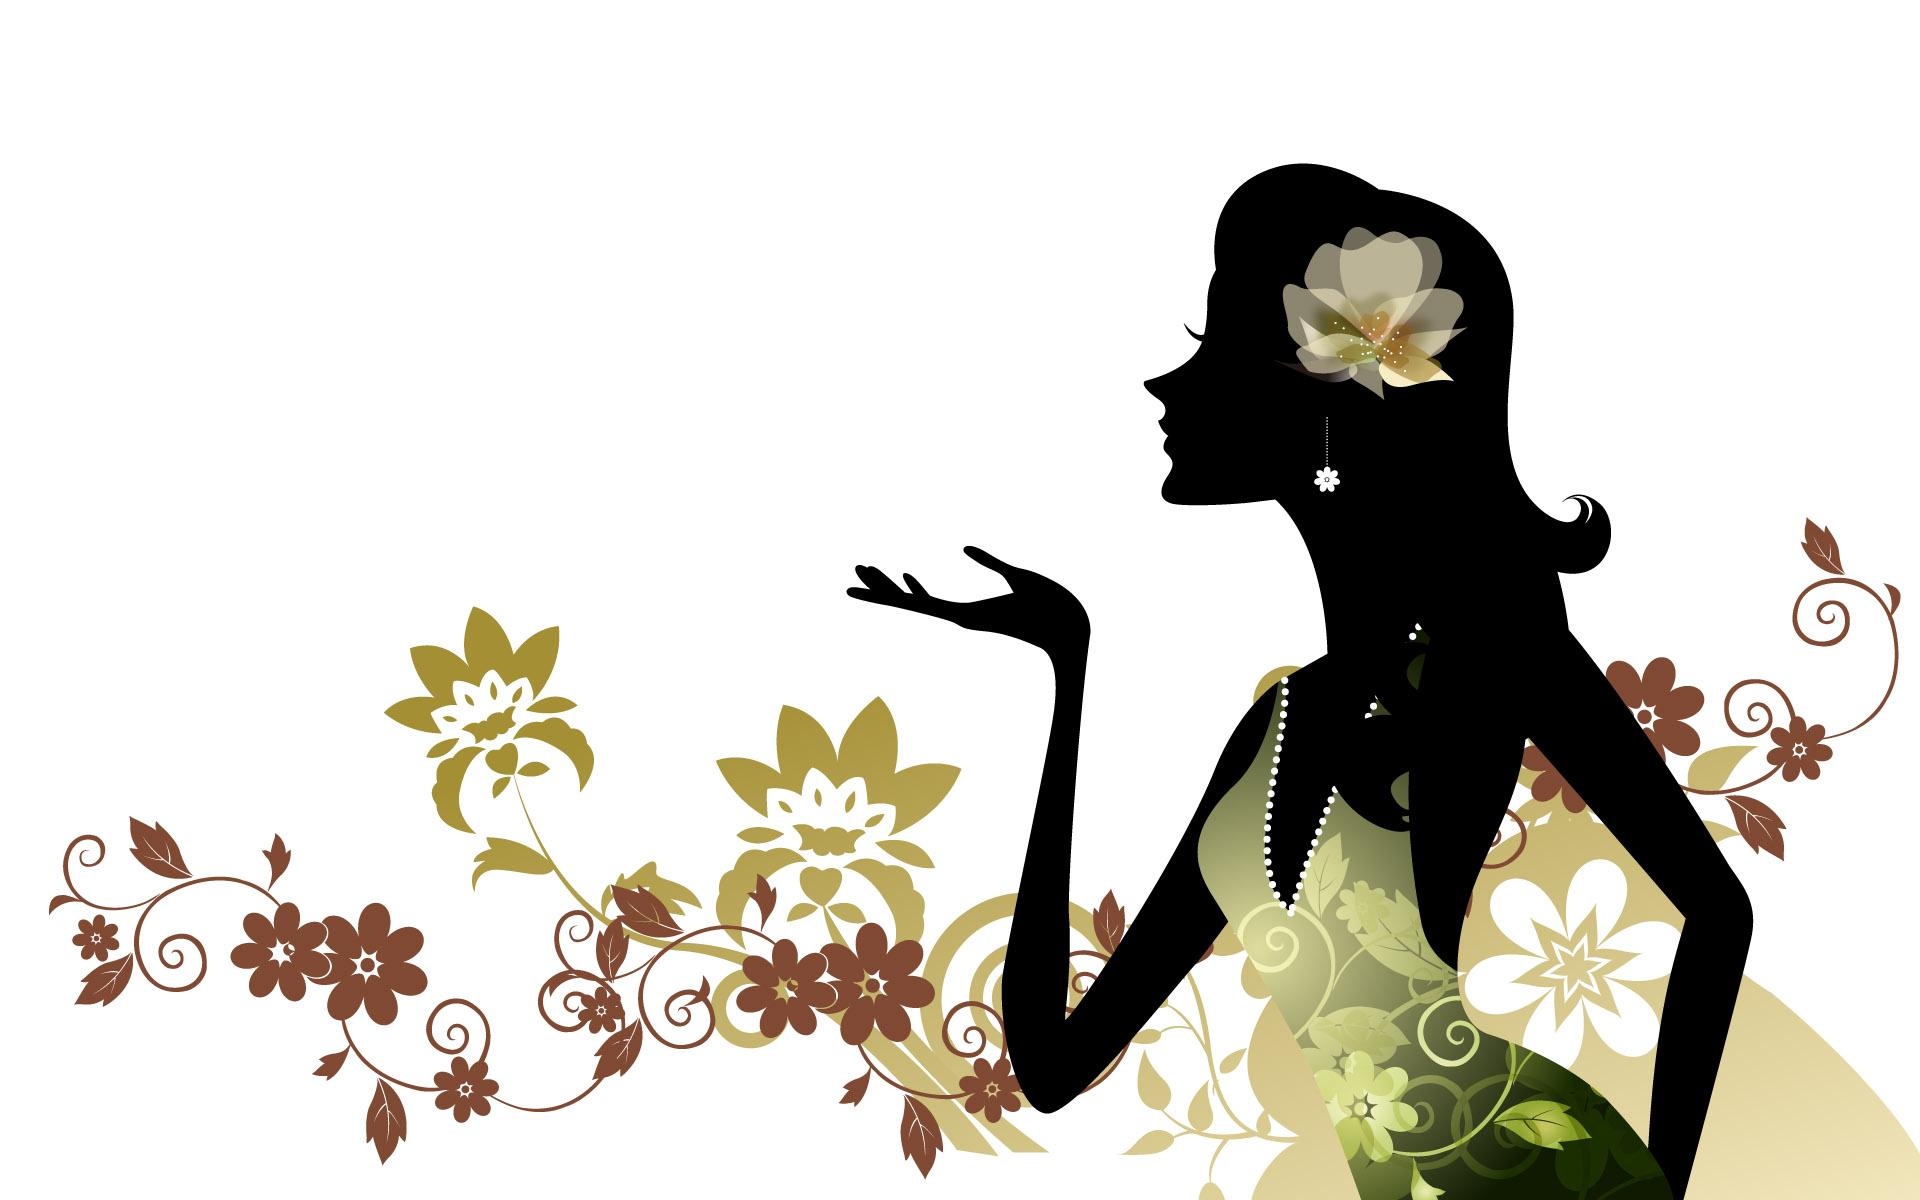 1920x1200 Digital Art Girl Silhouette Wallpaper 6 Buset Indonesian